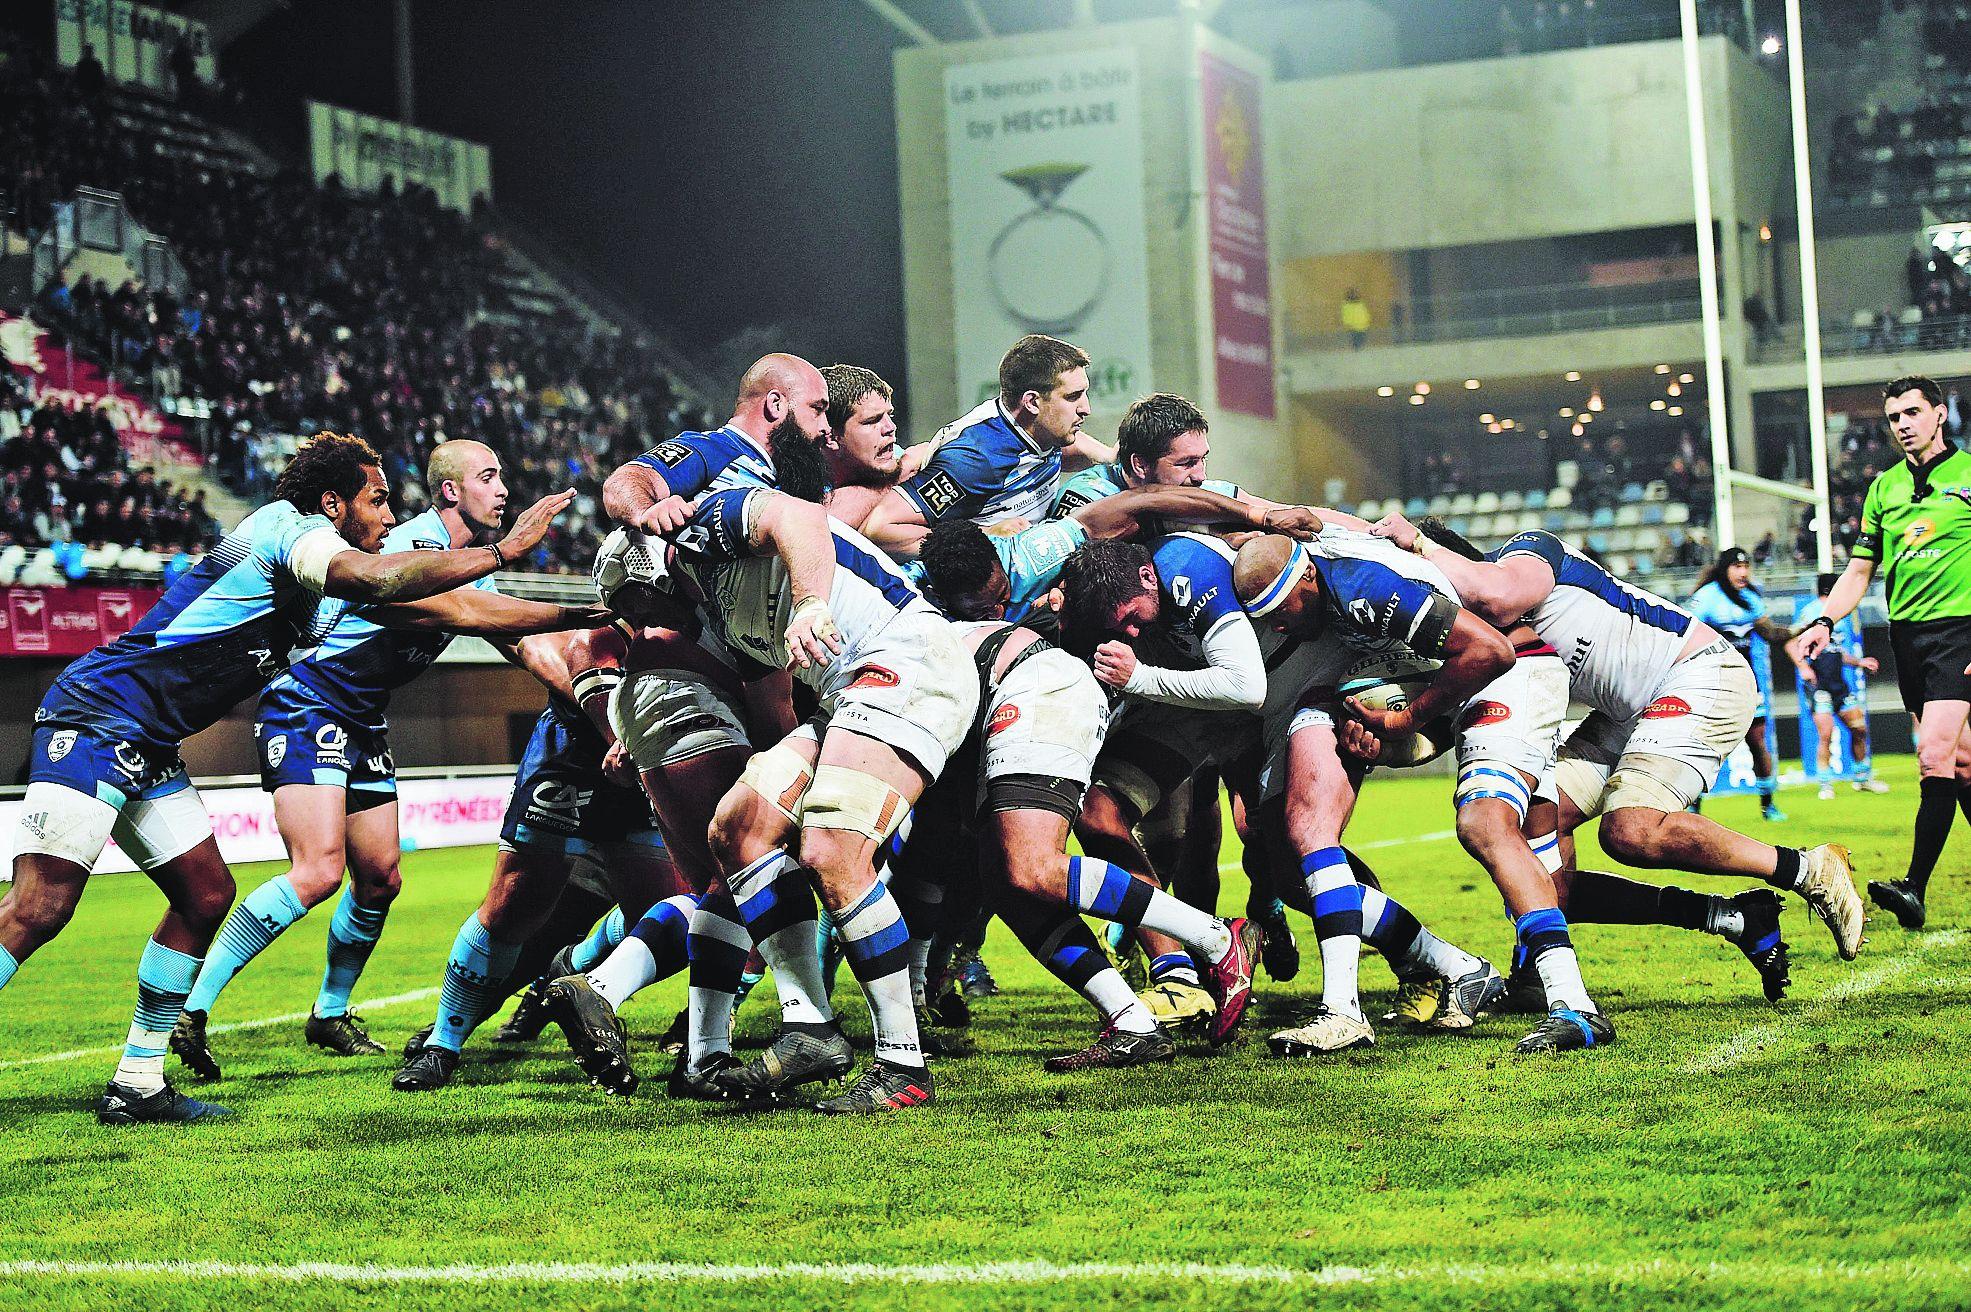 Rugby - Top 14 - Montpellier-Castres, une opposition totale en finale du Top 14